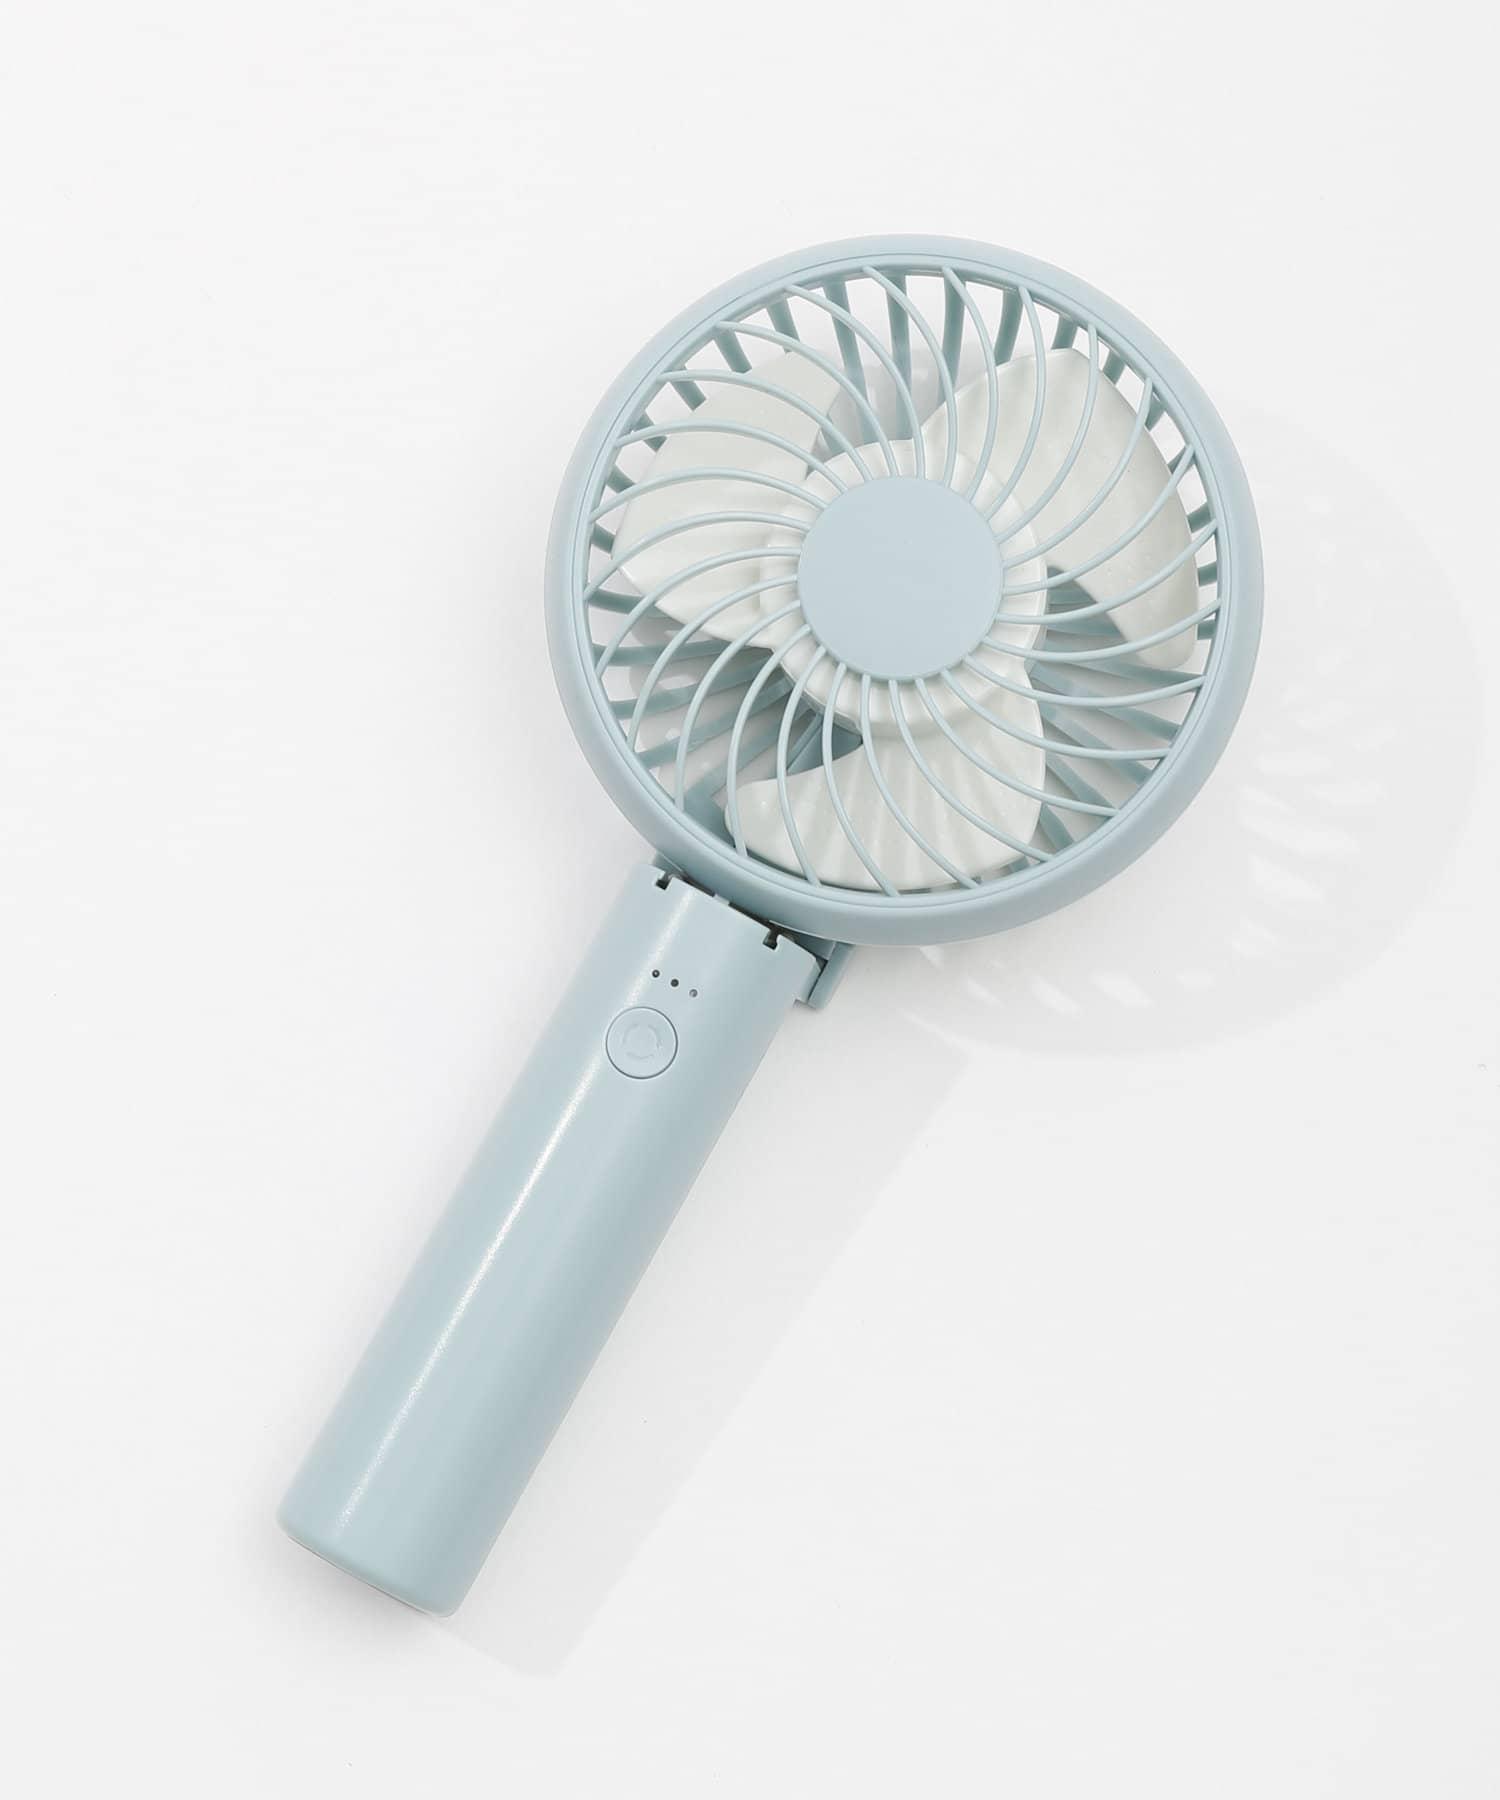 3COINS(スリーコインズ) ライフスタイル 【熱中症対策】充電式静音ハンディファン ブルー